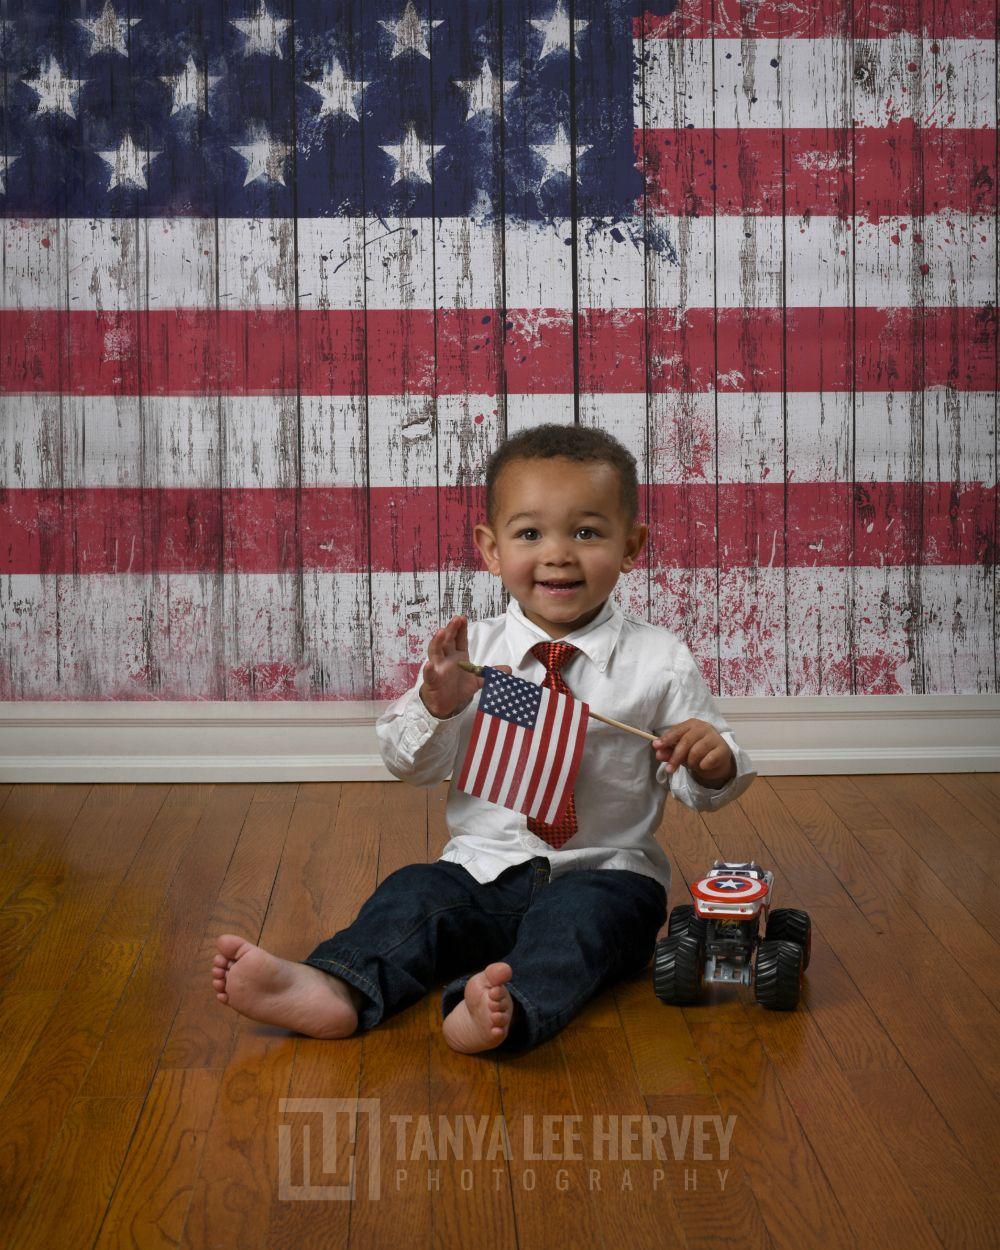 Vintage American Flag Planks Backdrop or Floor from Backdrop Express